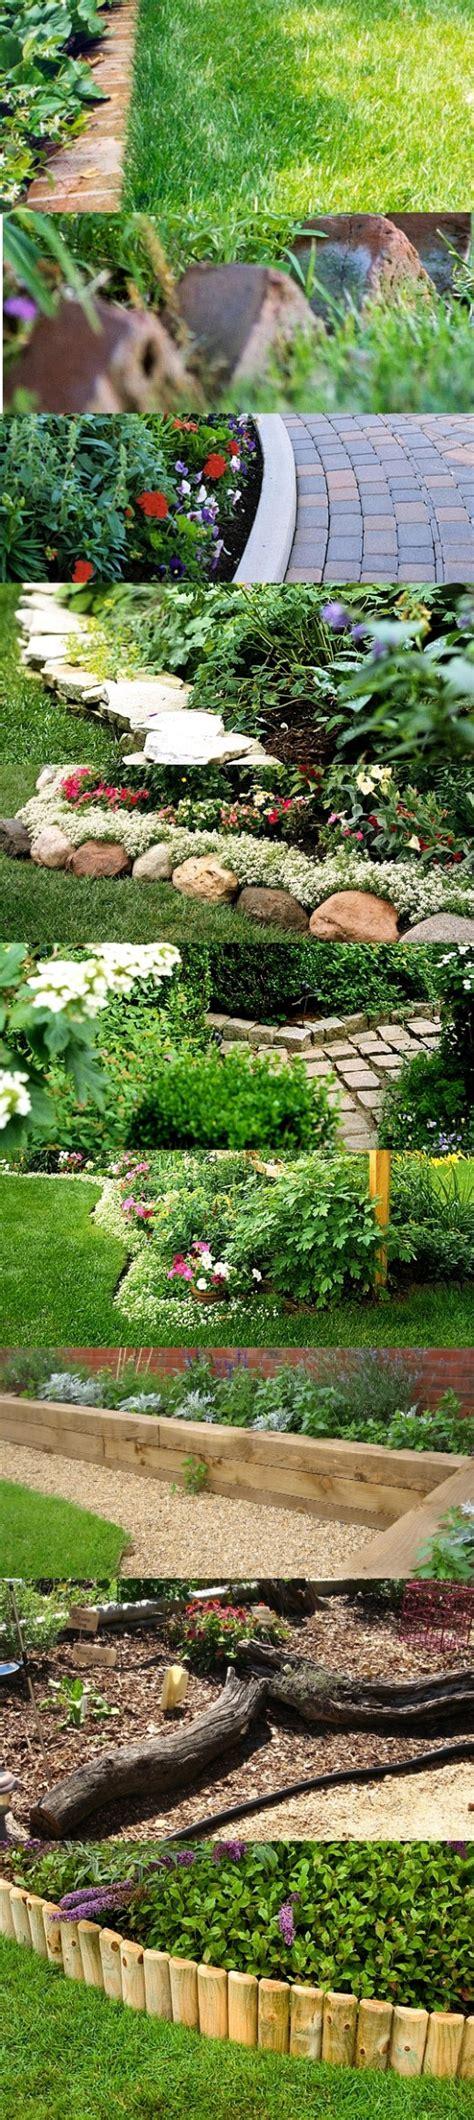 garden bed borders edging ideas for vegetable and flower